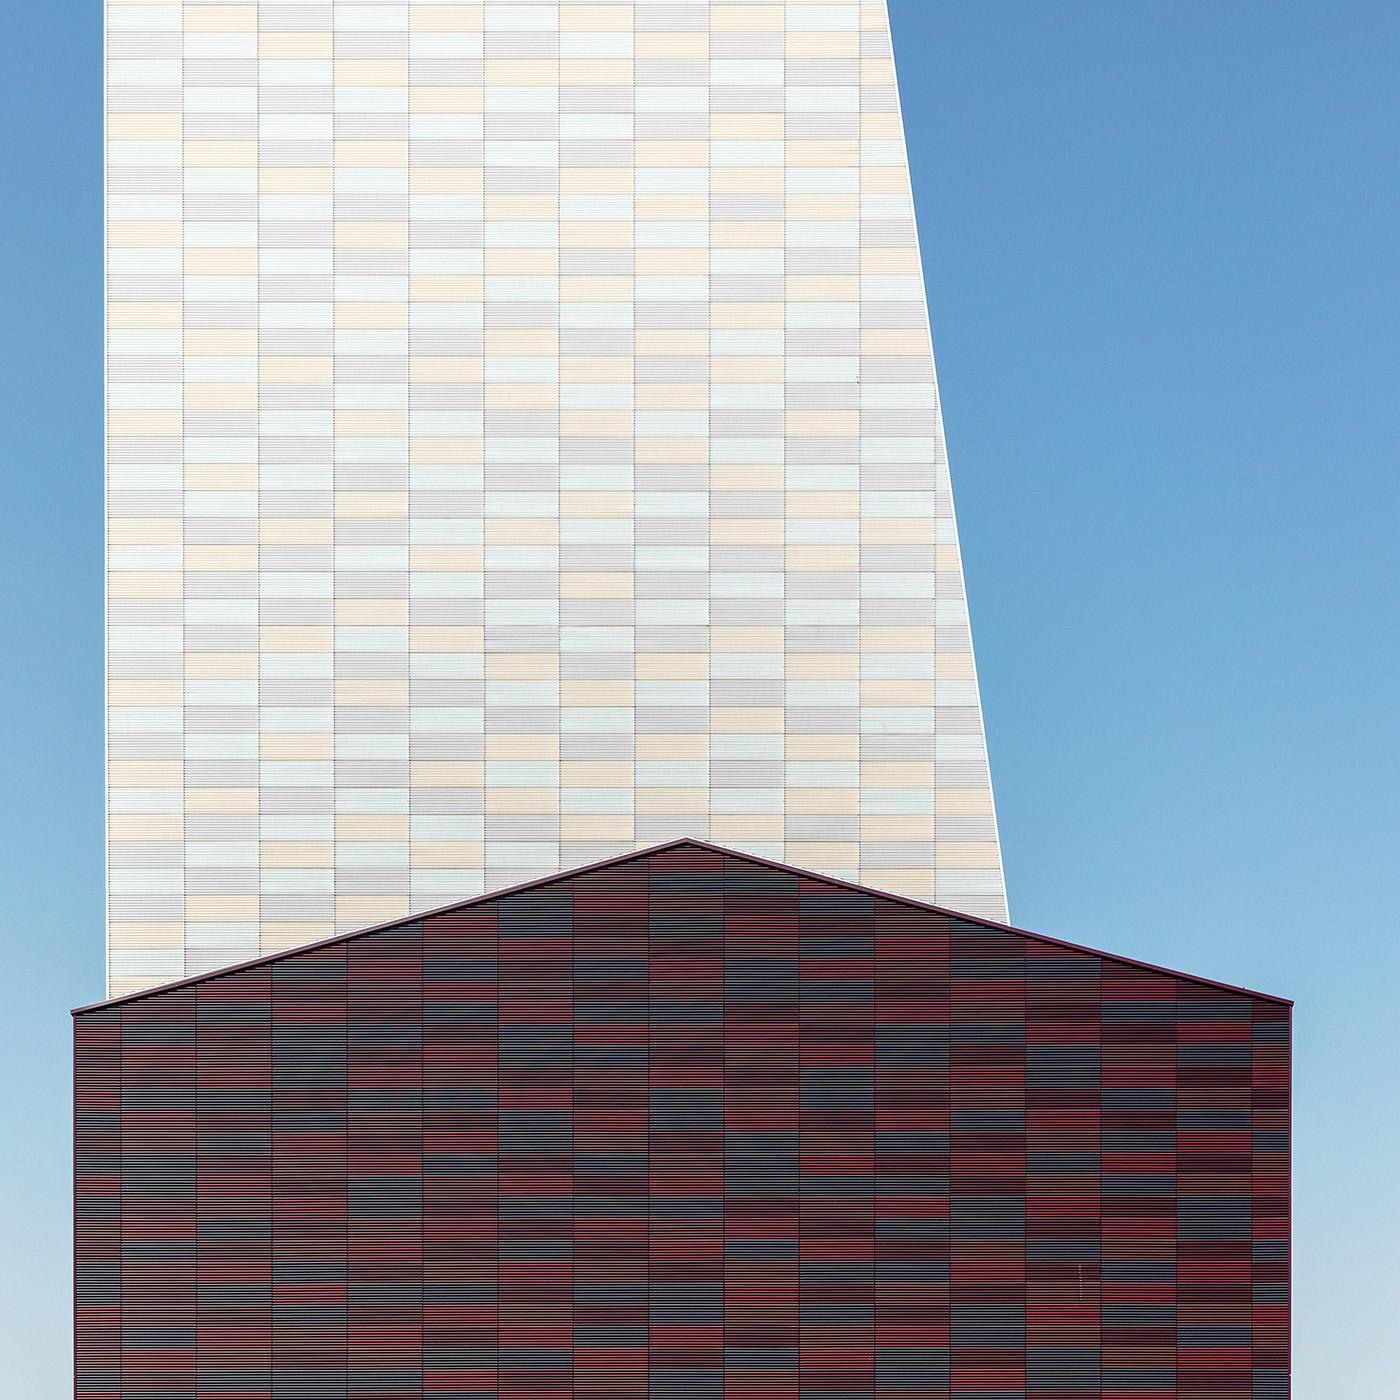 ECCO Power Station . Location: Ban de Gasperich, Luxembourg . Architect: Beng Architectes Associes